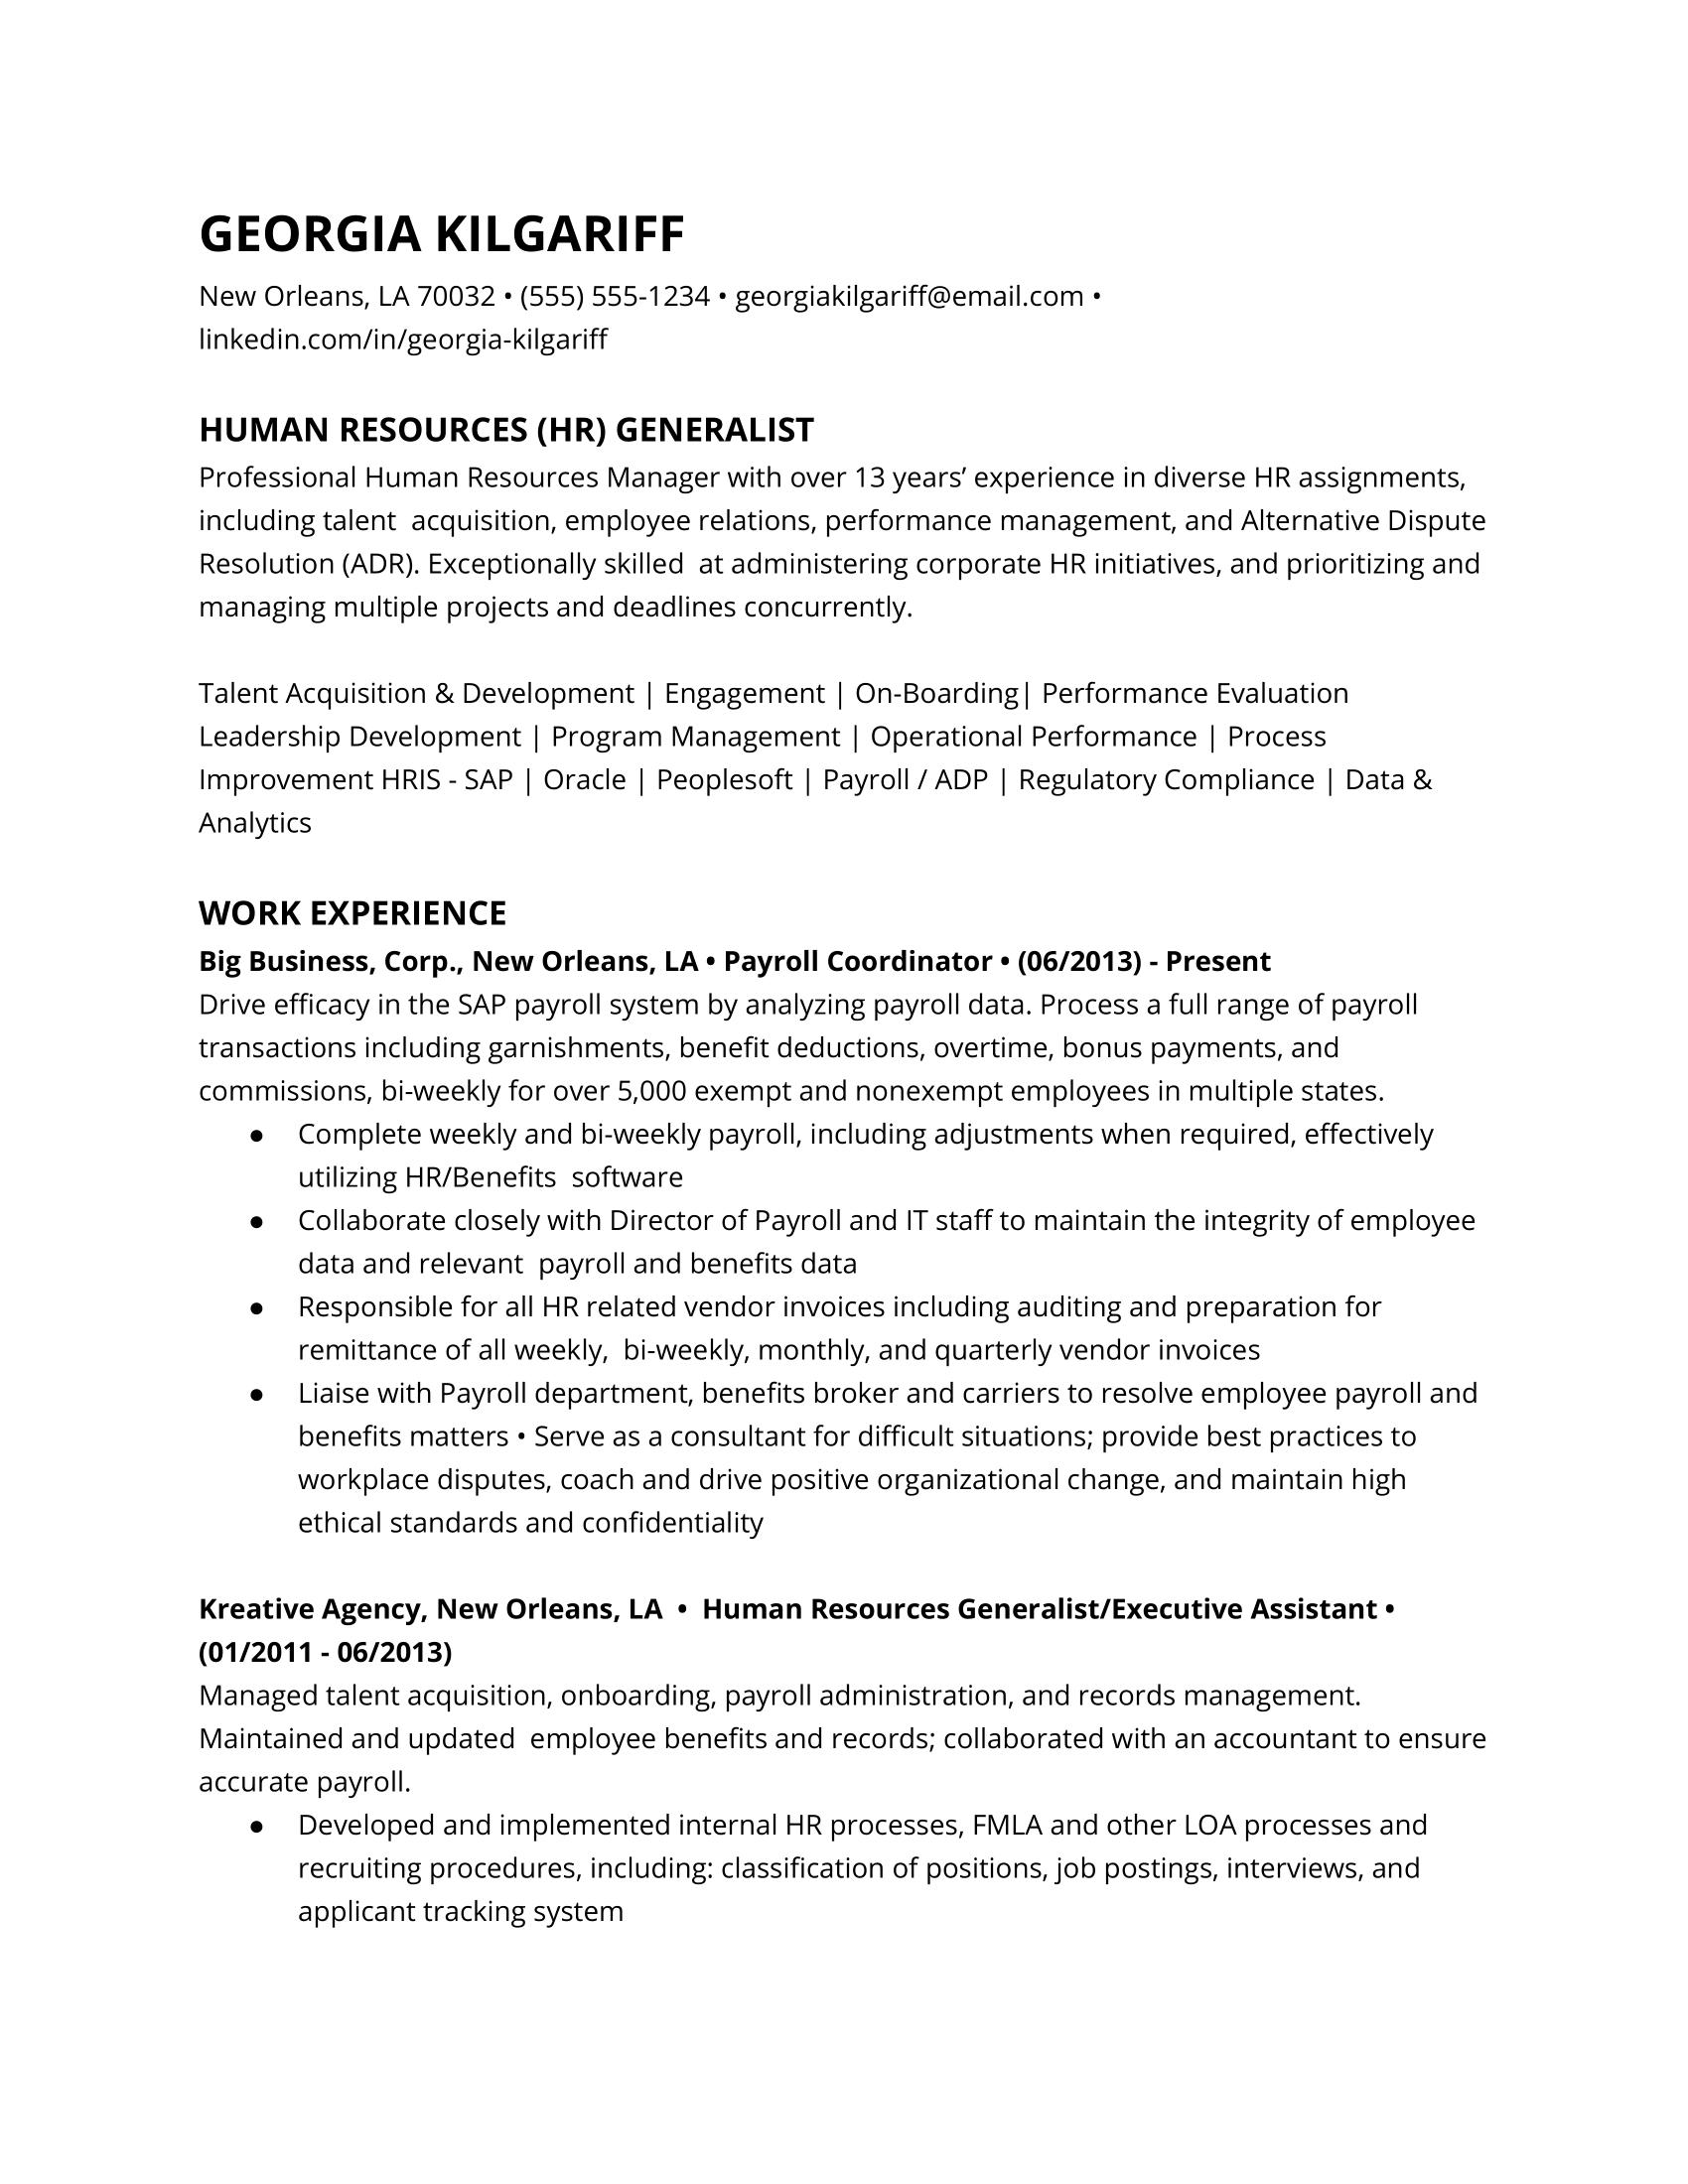 HR Generalist Resume Example